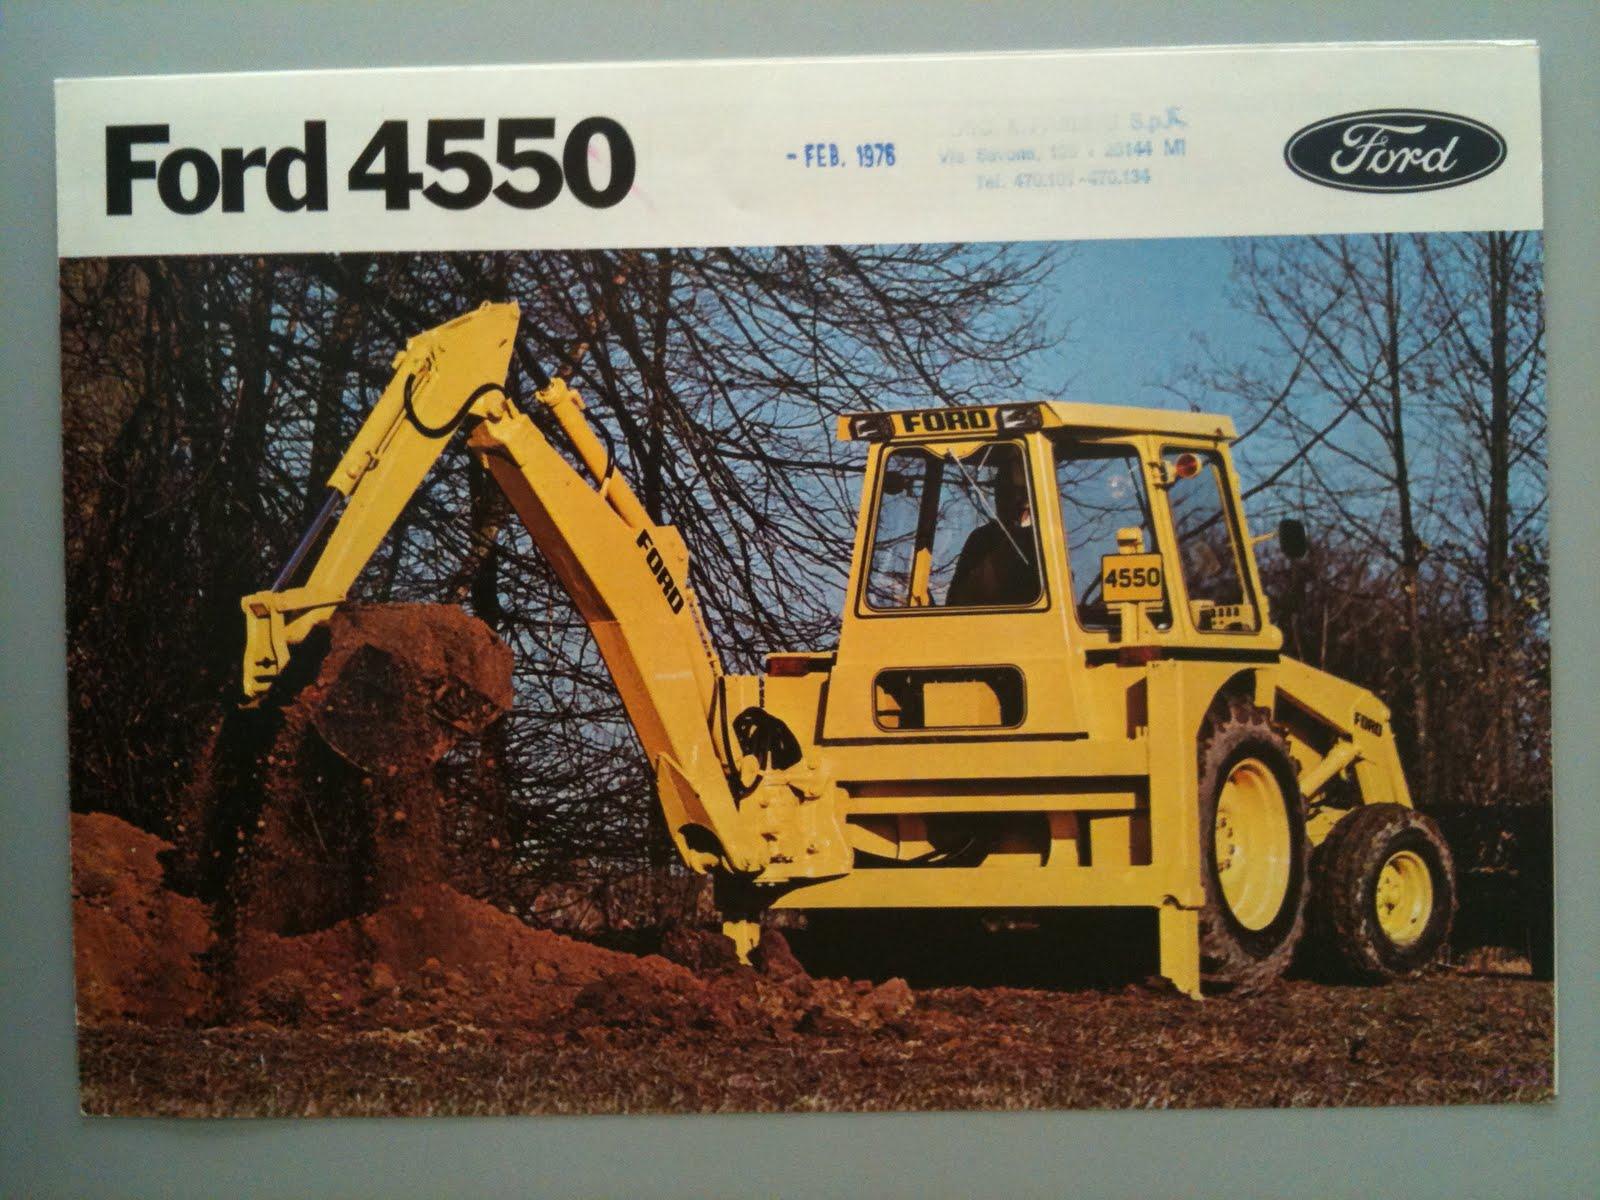 Earthmoving Machinery Sales Brochures Ford Backhoe 4550 border=